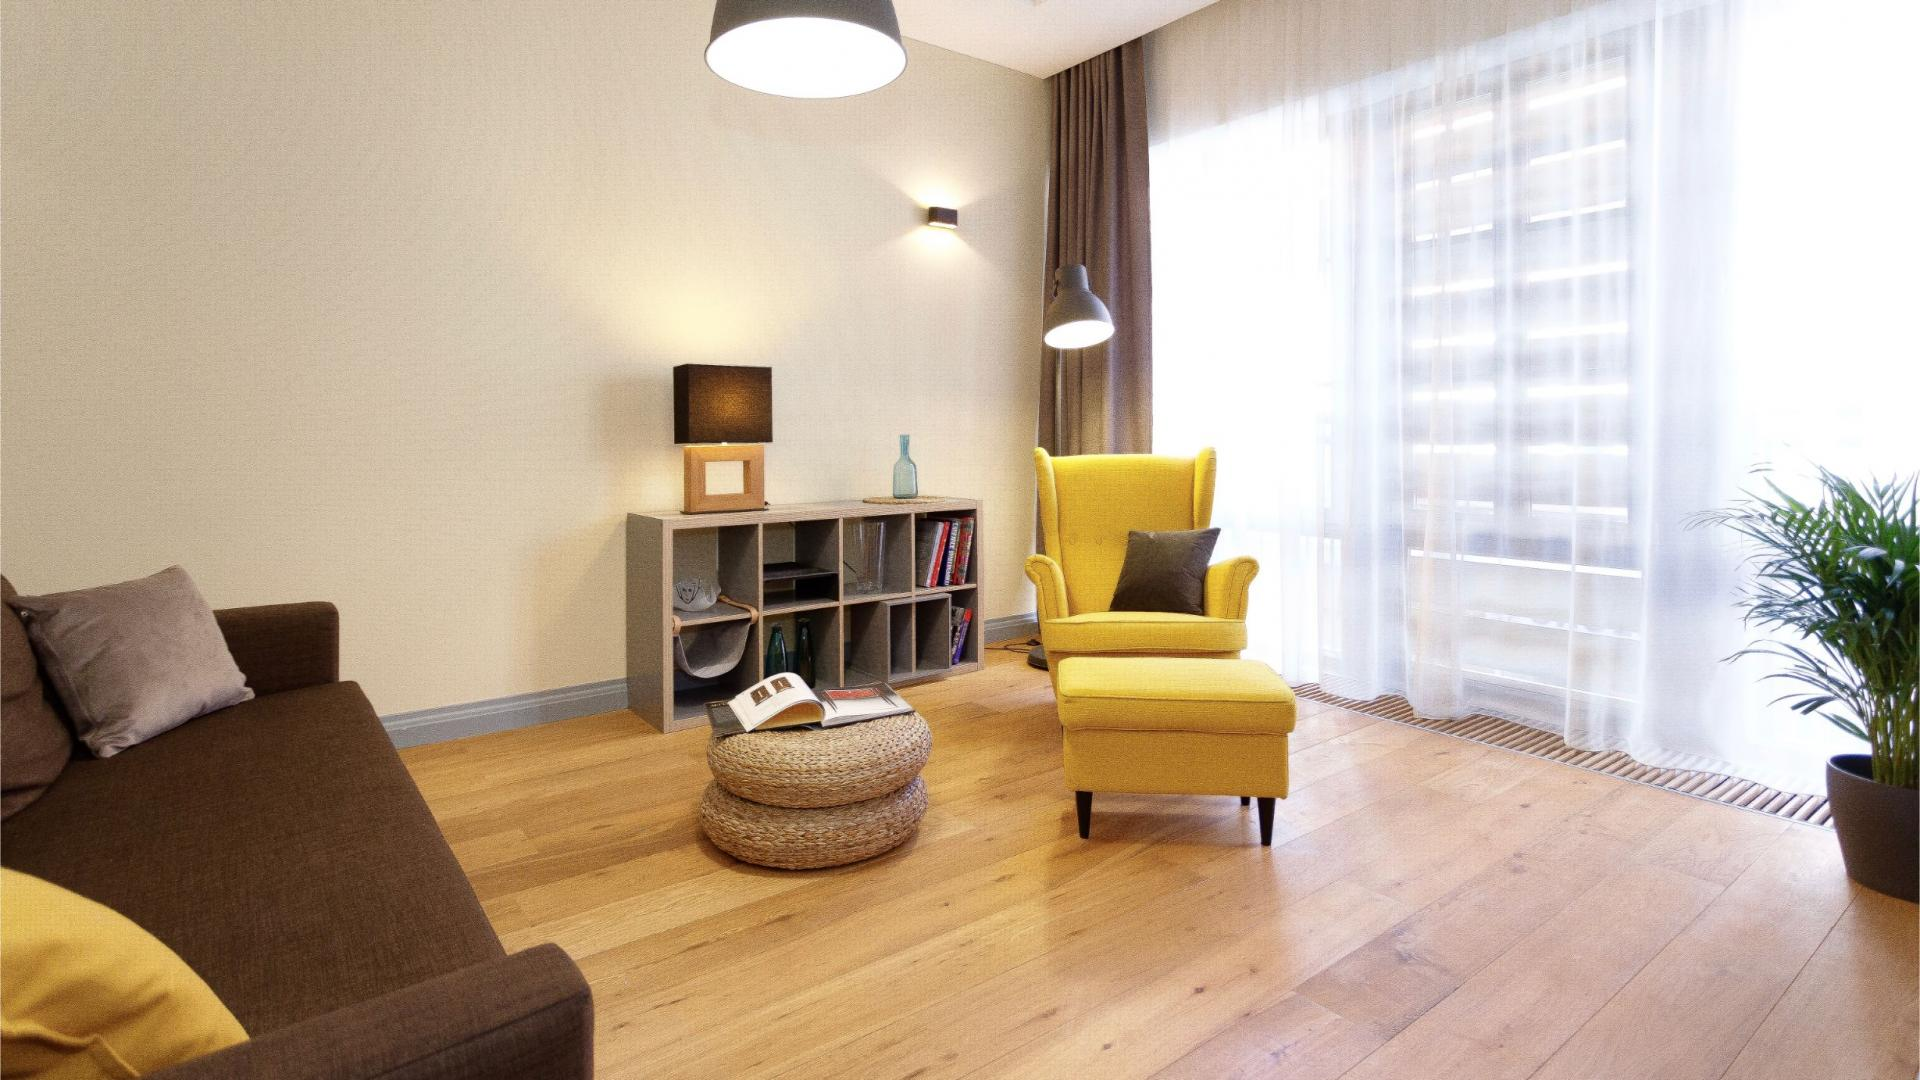 Spacious living area at Siauliu Town Hall Apartment